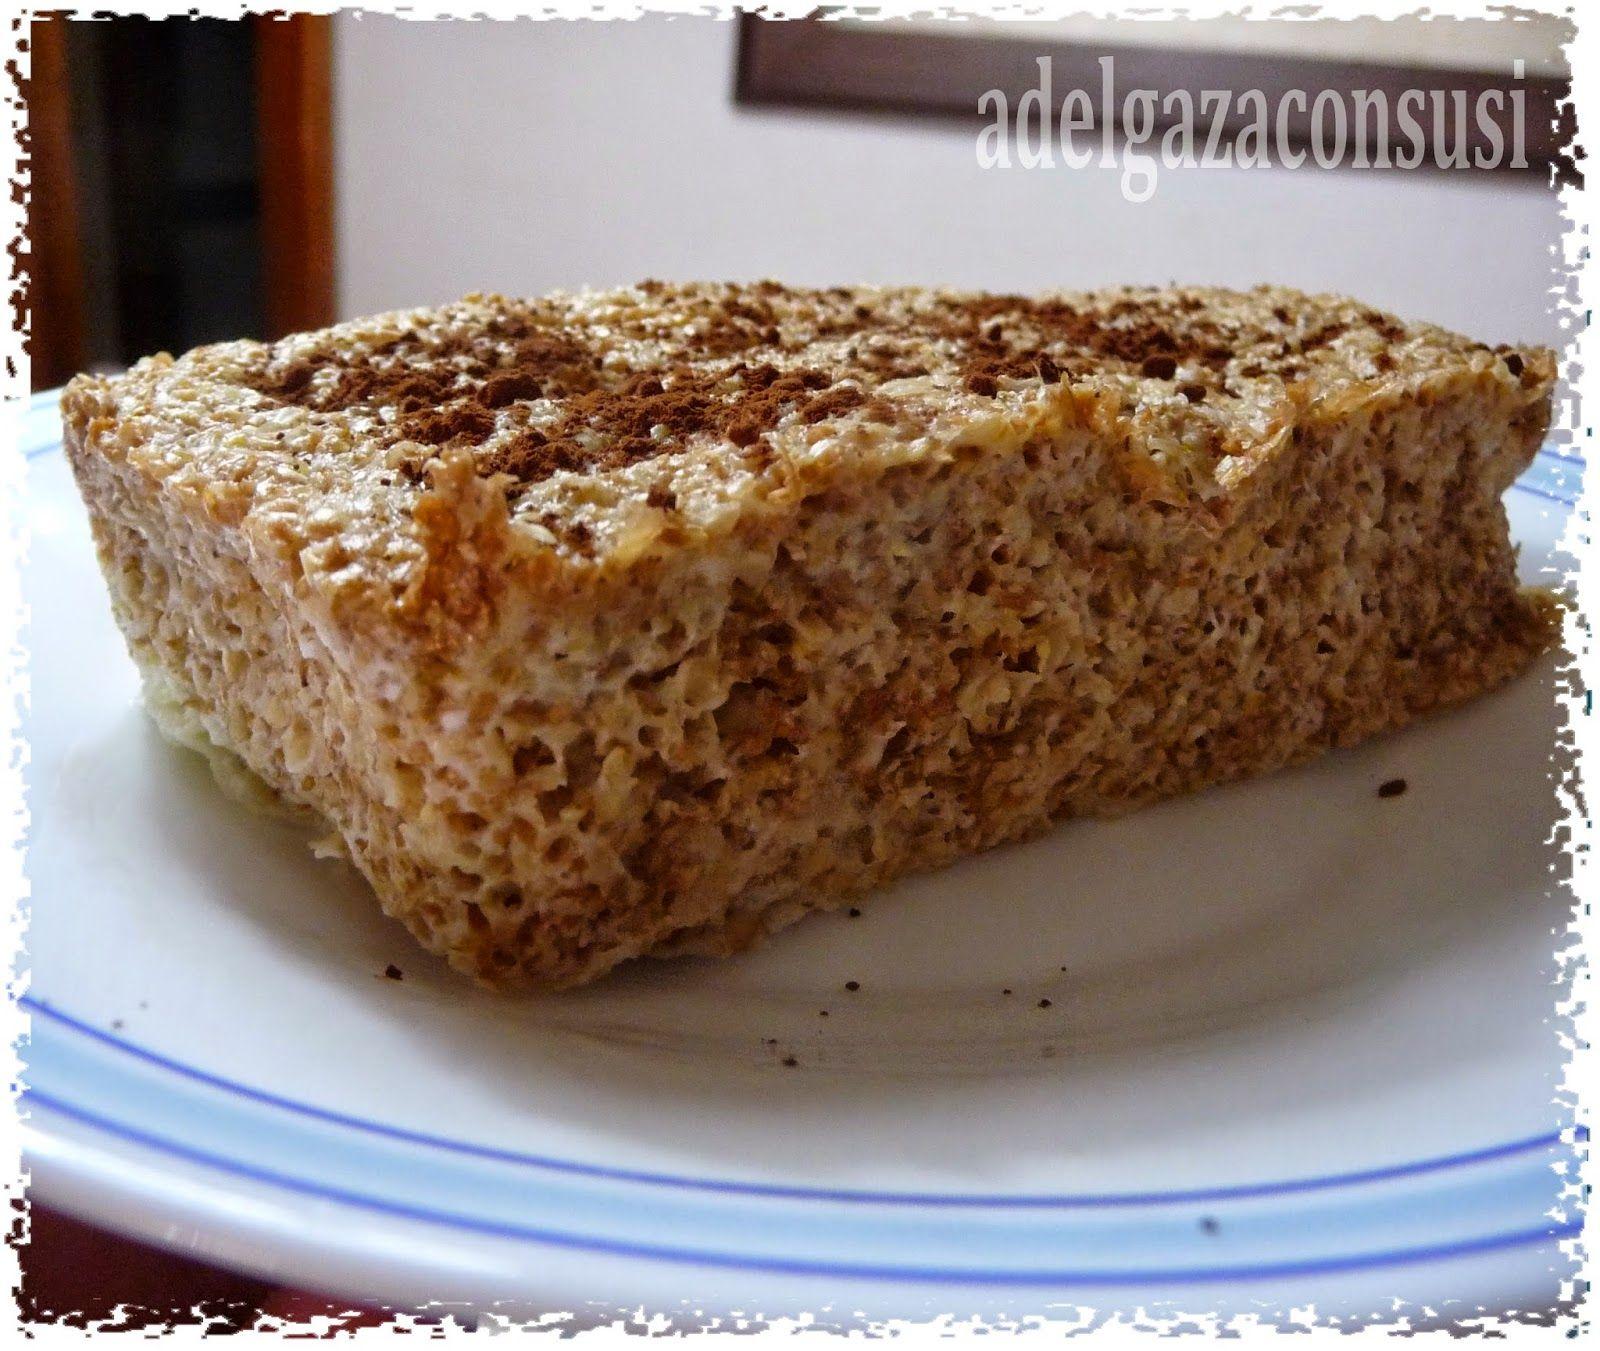 Adelgaza con susi recetas light bizcocho de salvados - Bizcocho con microondas ...